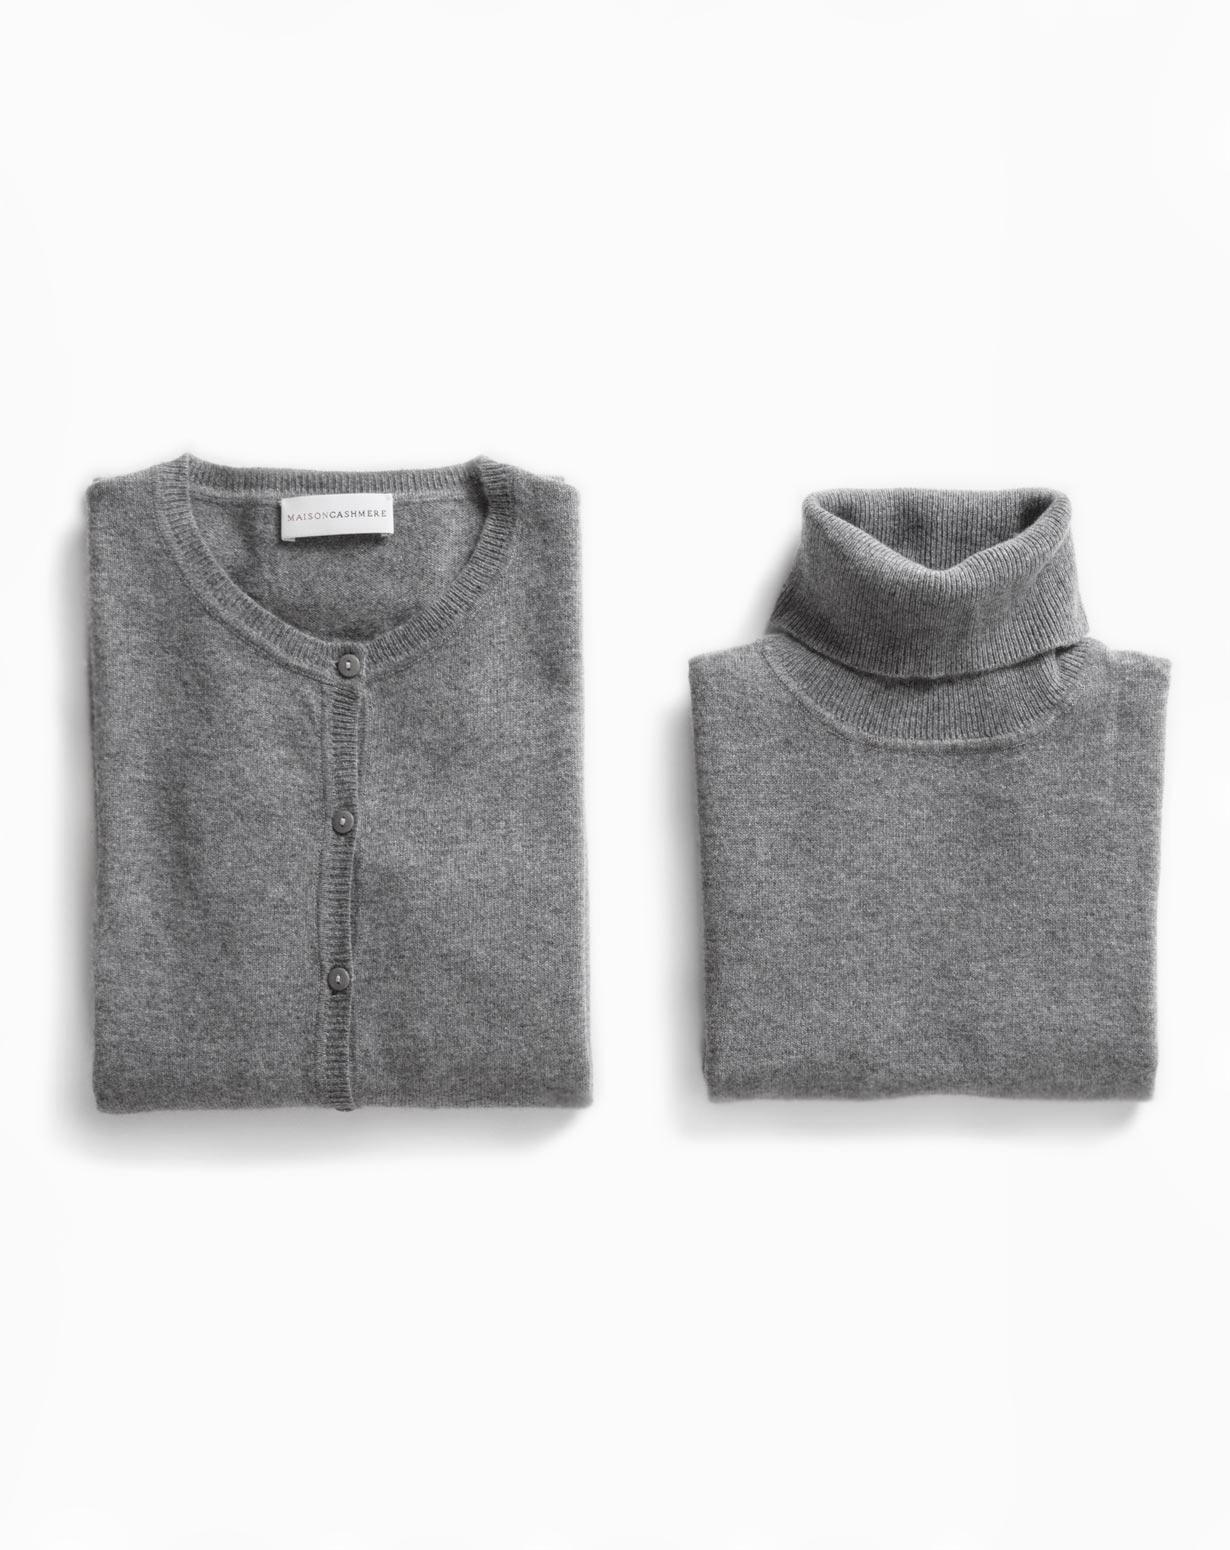 Ladies' Dark Grey Twinset - Cardigan & Sleeveless Polo Neck